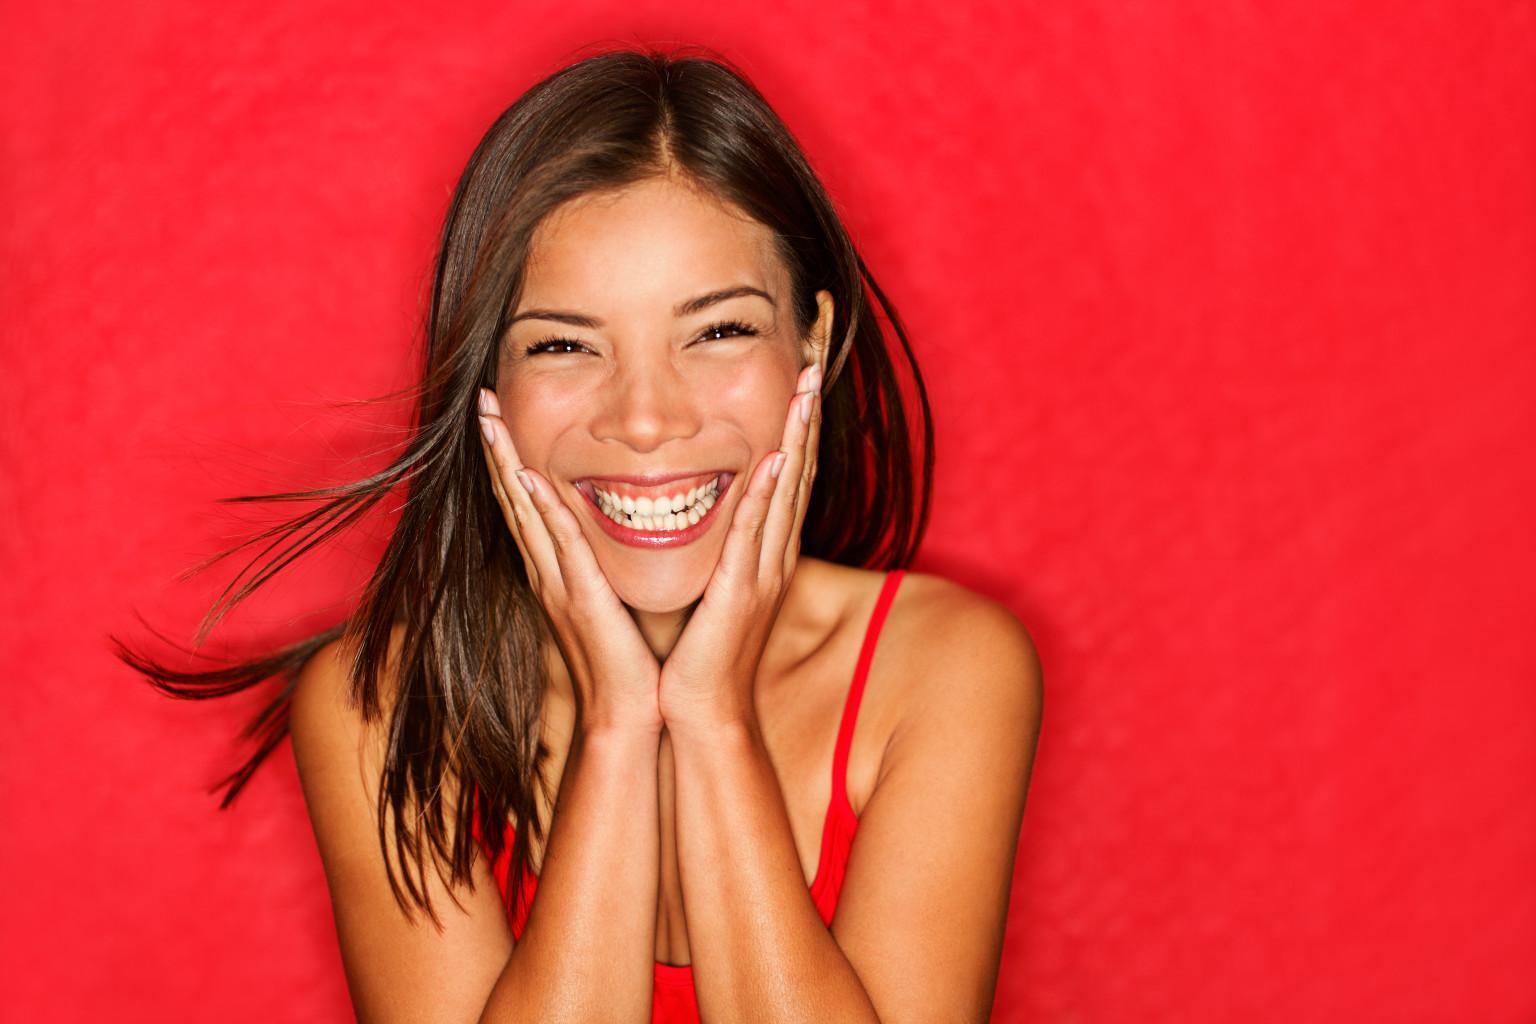 I 10 benefici dell'autoerotismo.